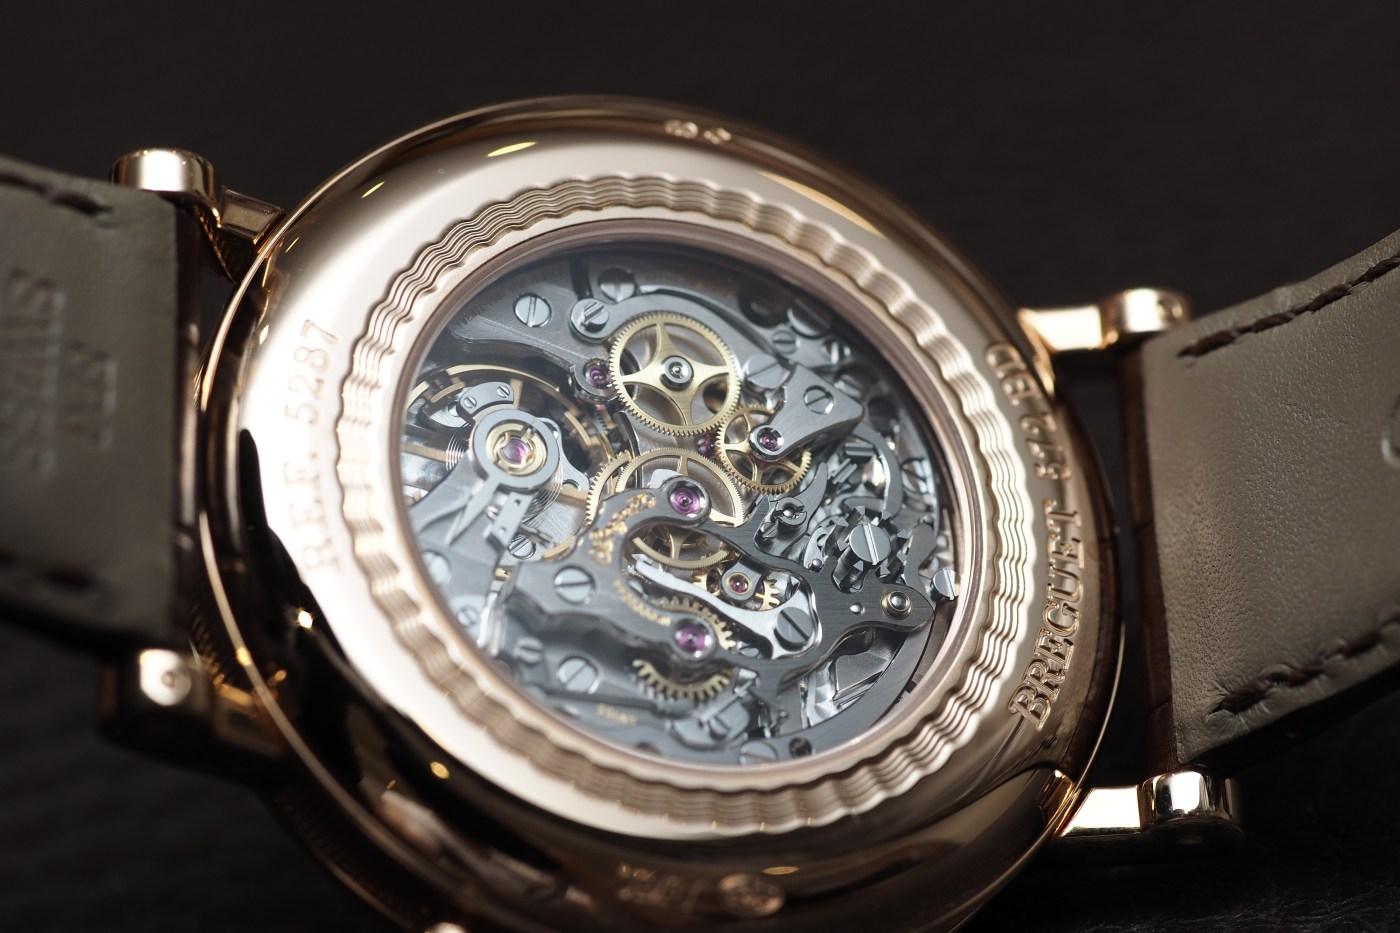 Breguet Classique Chronograph 5287